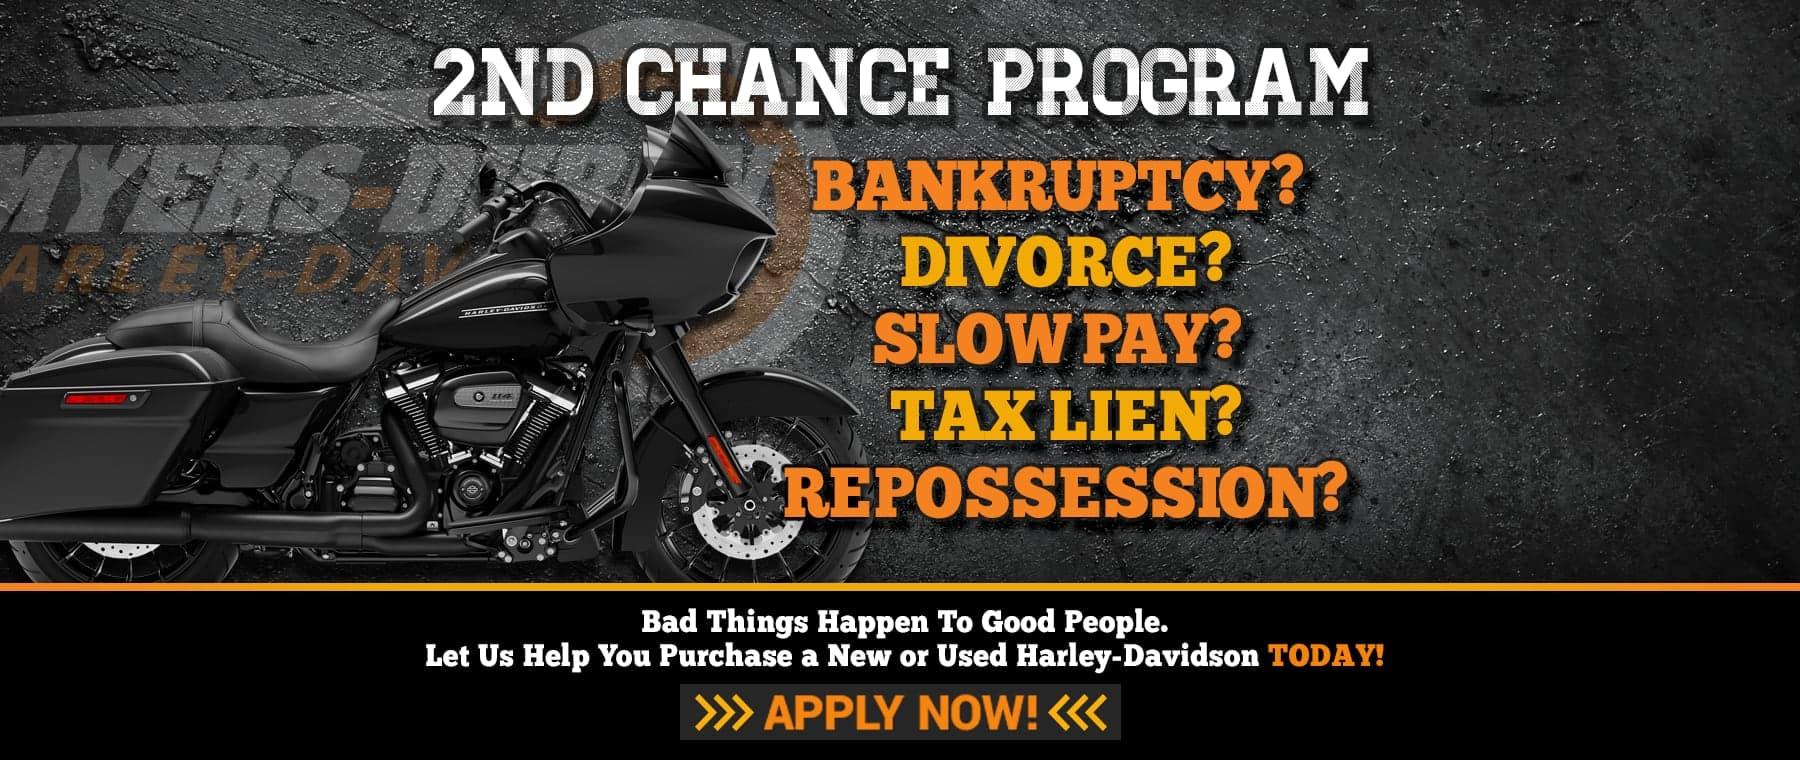 2nd Chance Financing at Myers-Duren Harley-Davidson in Tulsa, Oklahoma